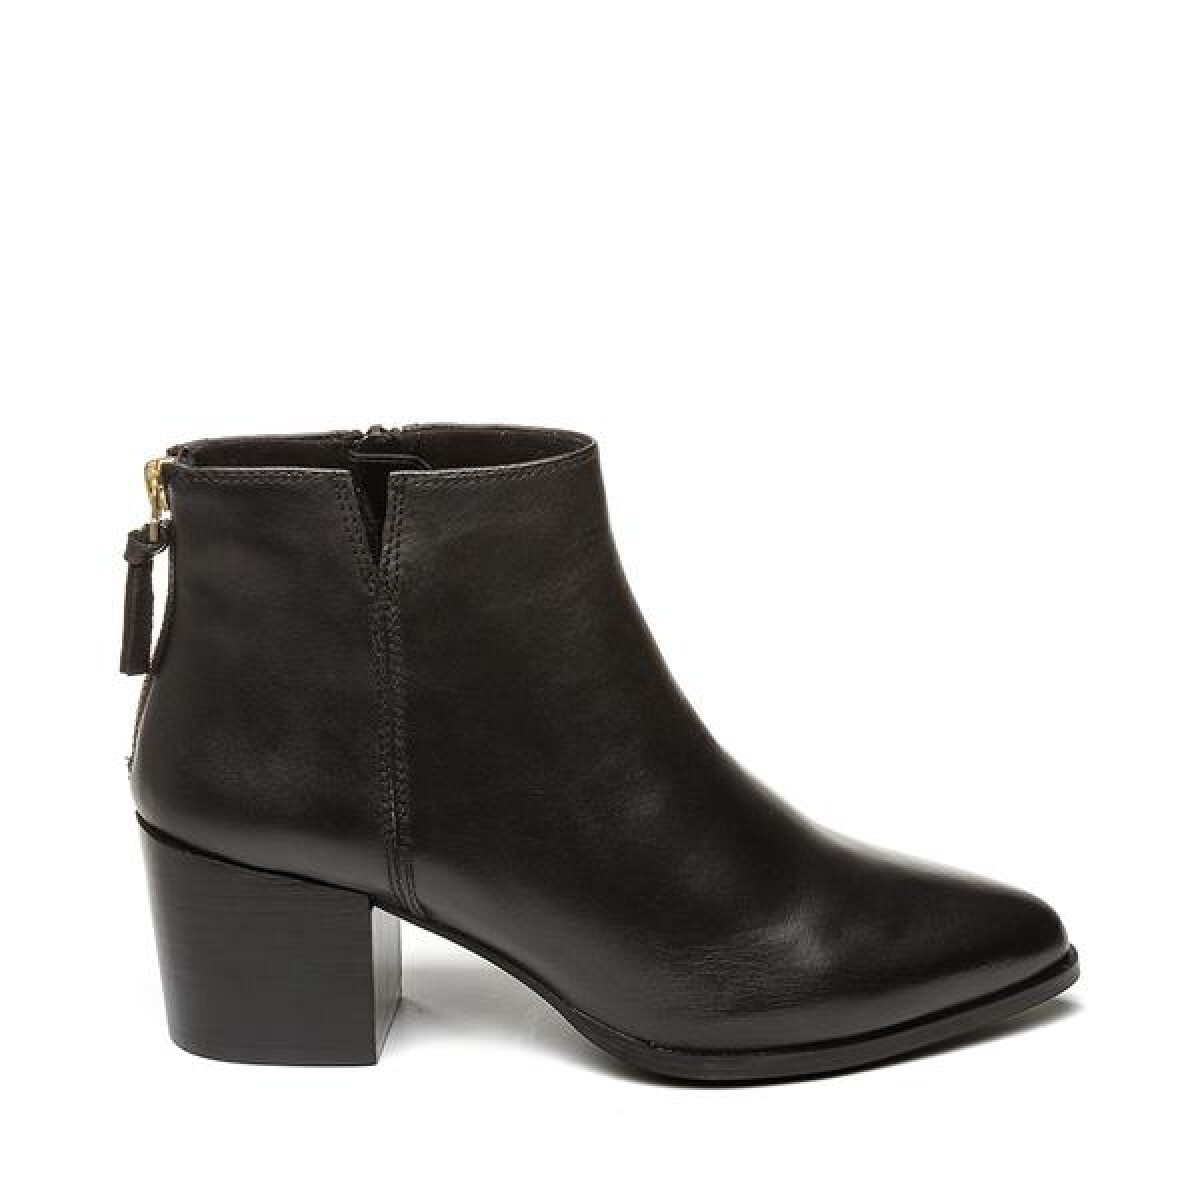 Steven NY Ankleboot Leather Black